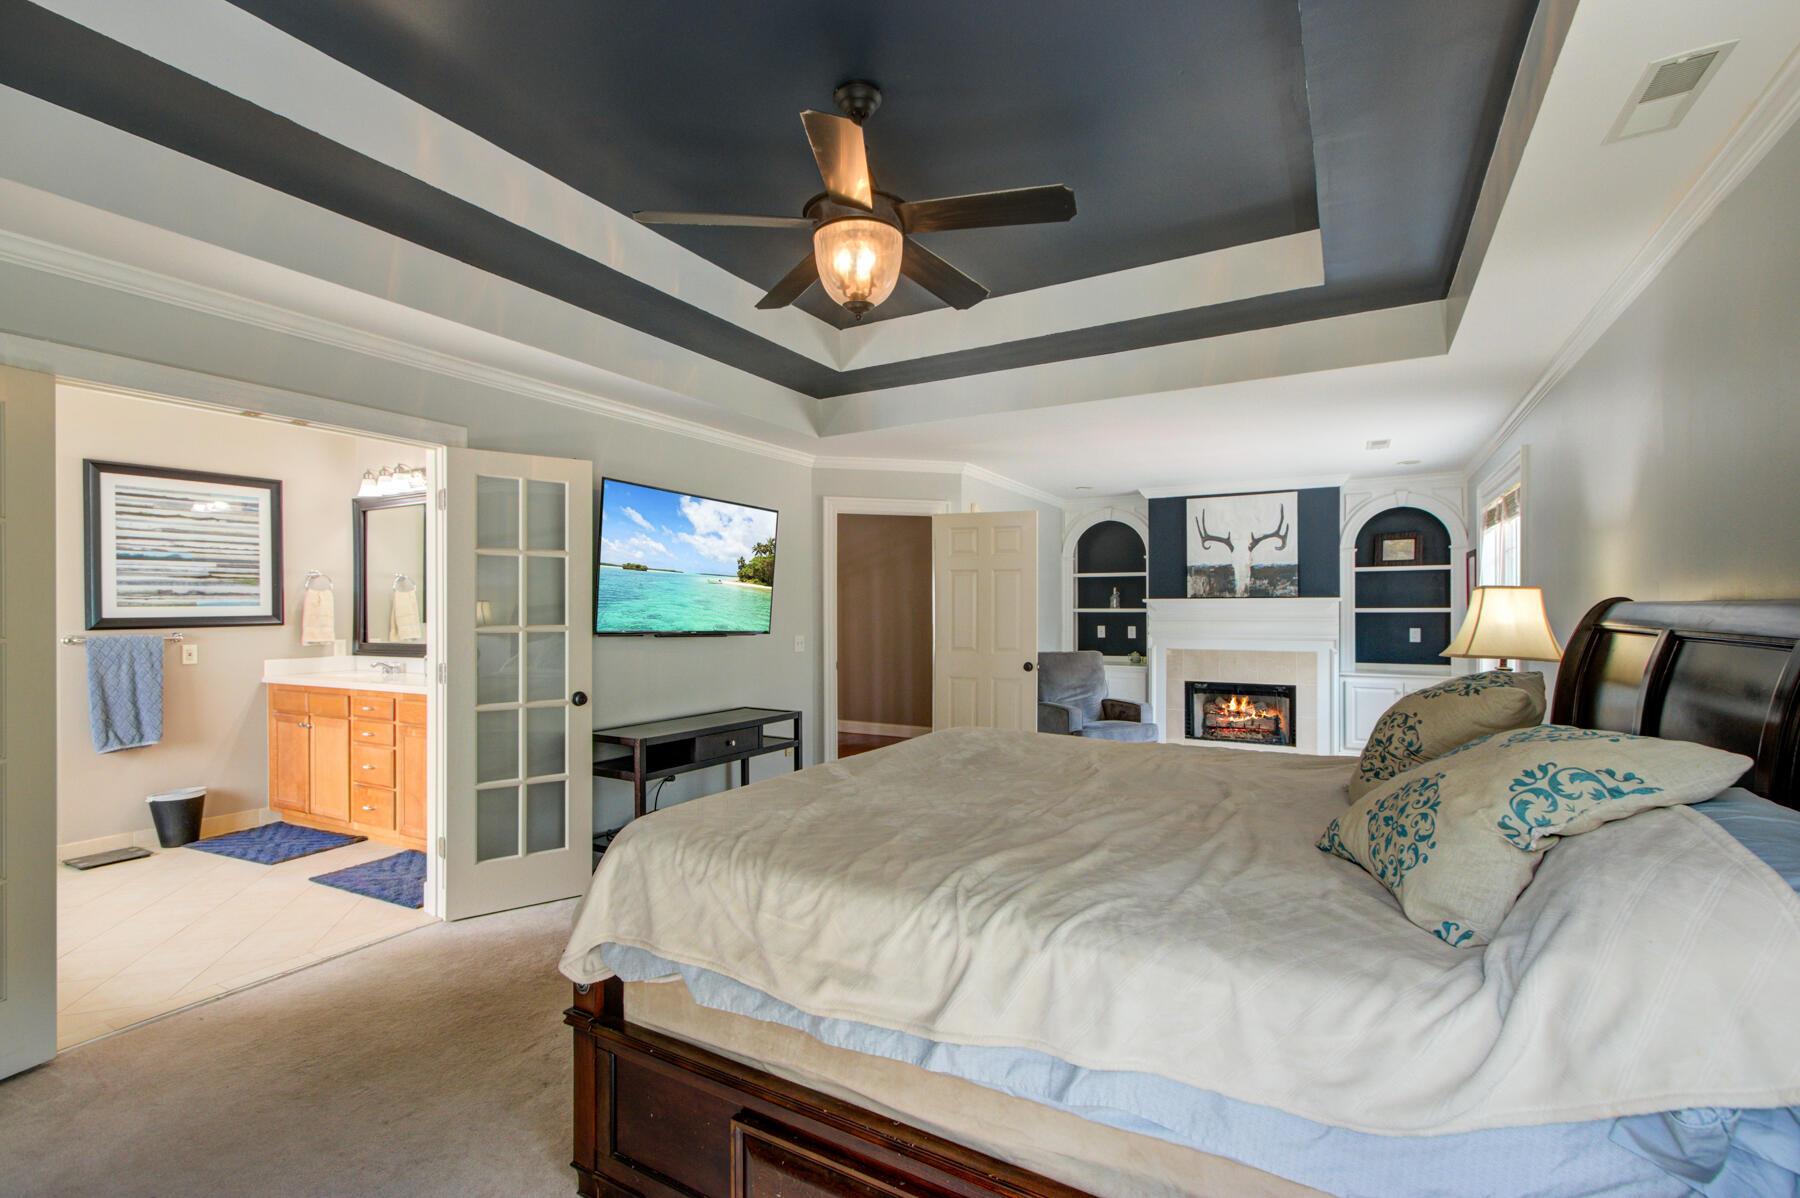 Dunes West Homes For Sale - 3095 Pignatelli, Mount Pleasant, SC - 29